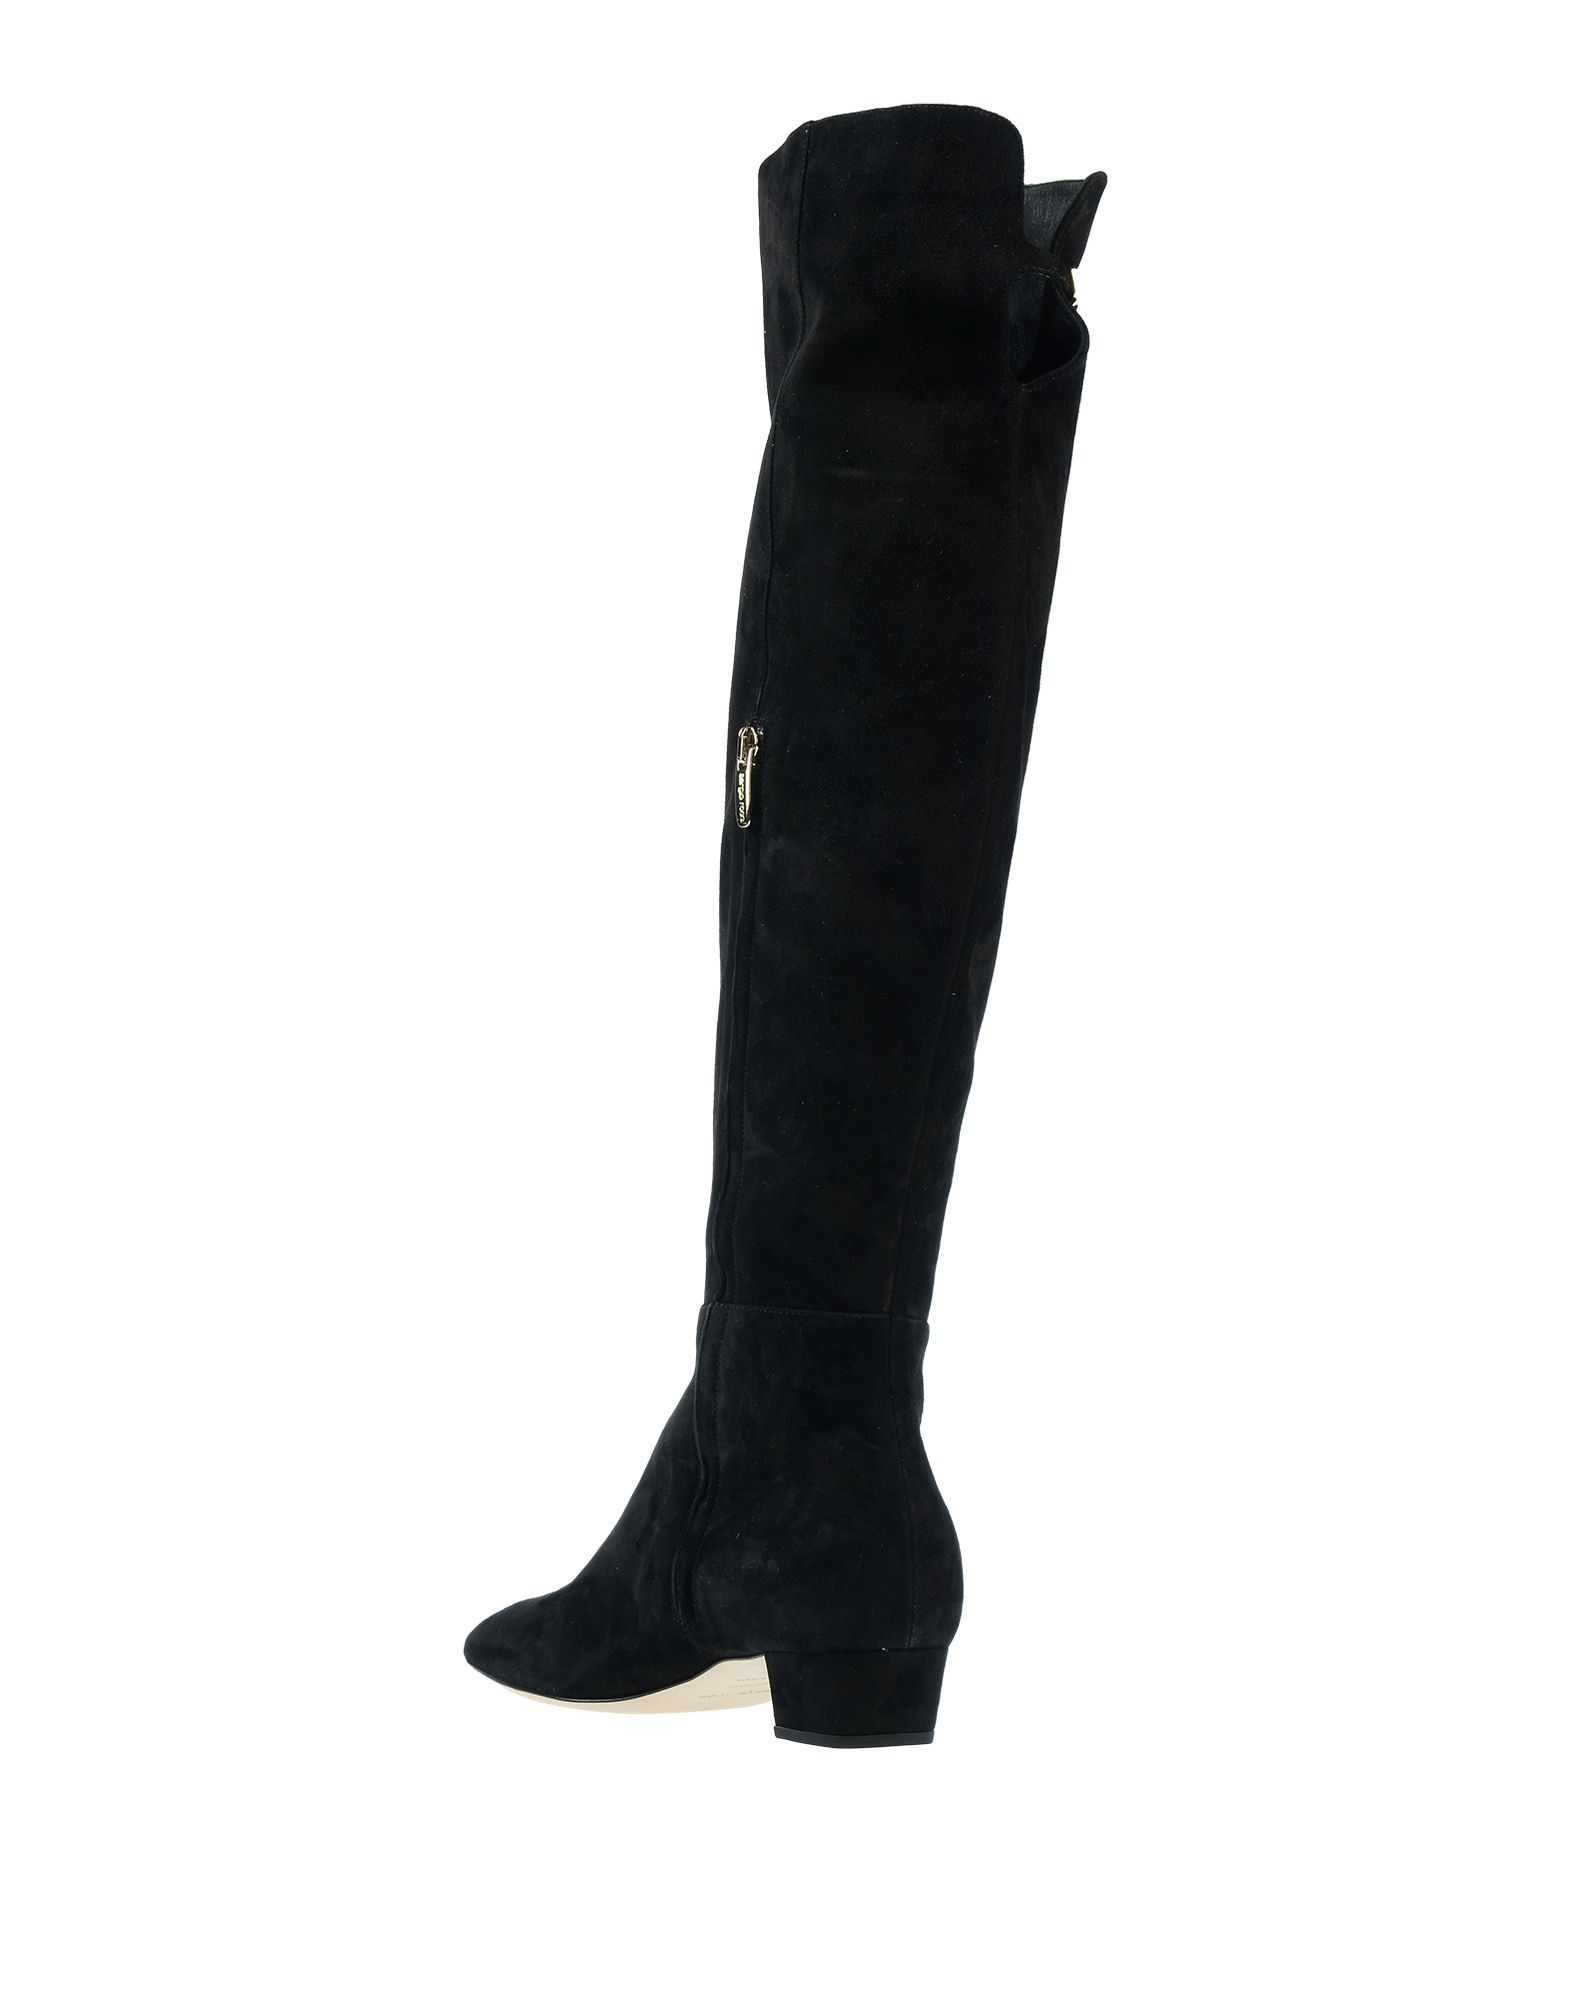 Sergio Rossi Women's Boots Black Leather